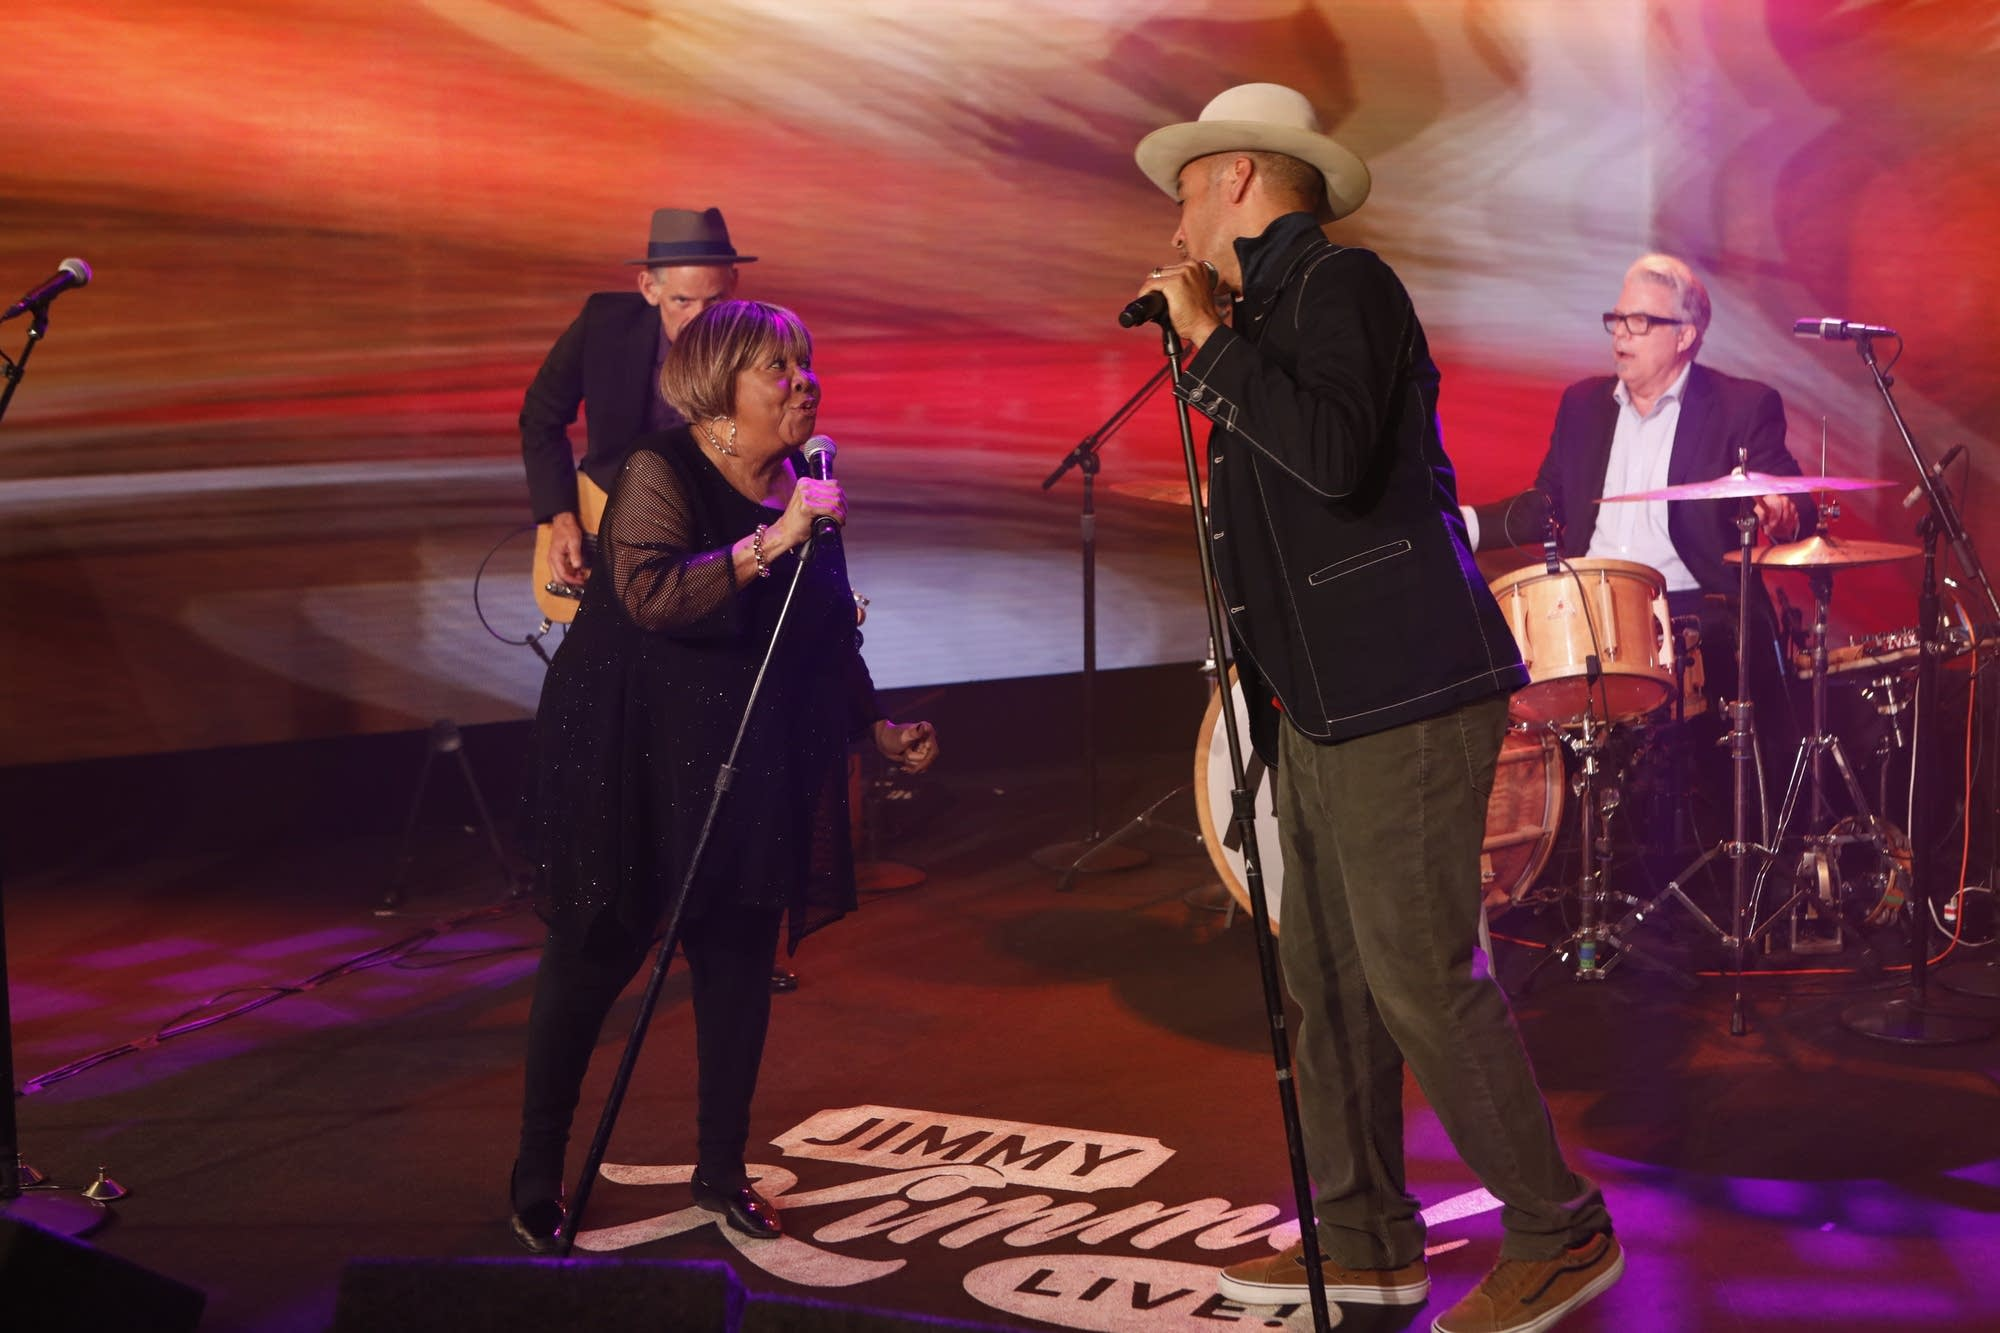 Mavis Staples performs with Ben Harper on 'Jimmy Kimmel Live!'